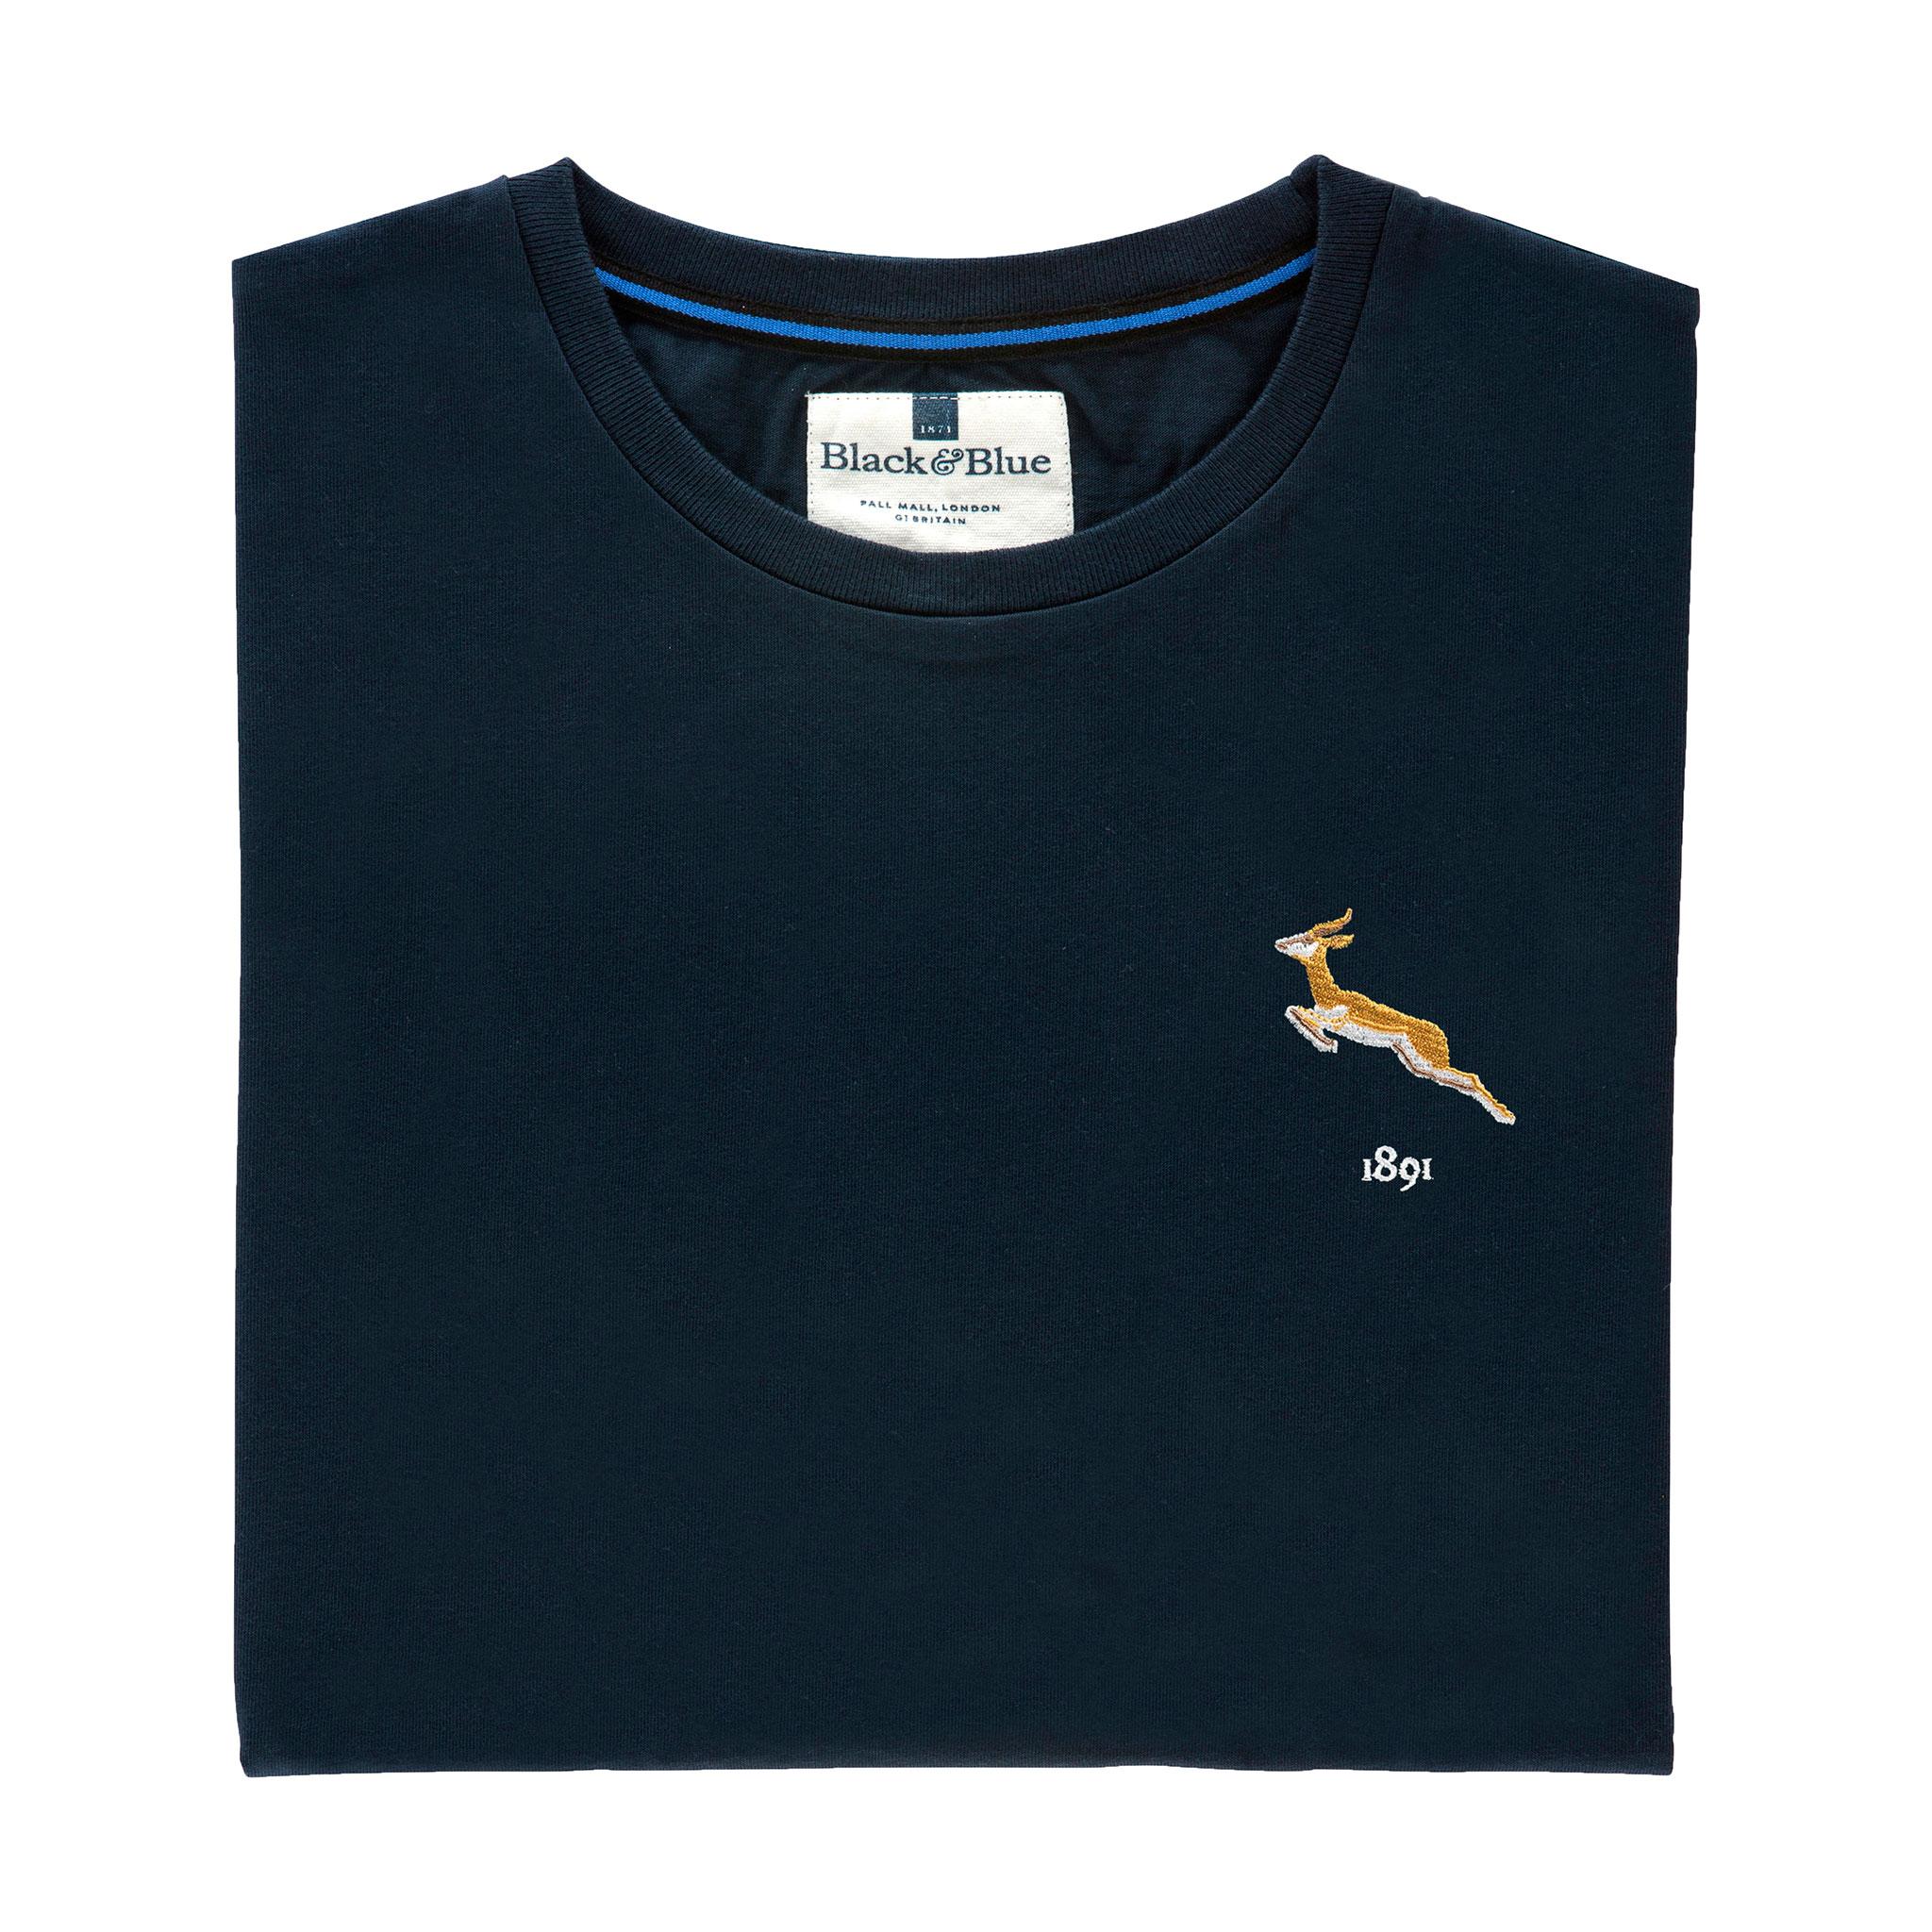 South Africa 1891 Navy Tshirt_Folded